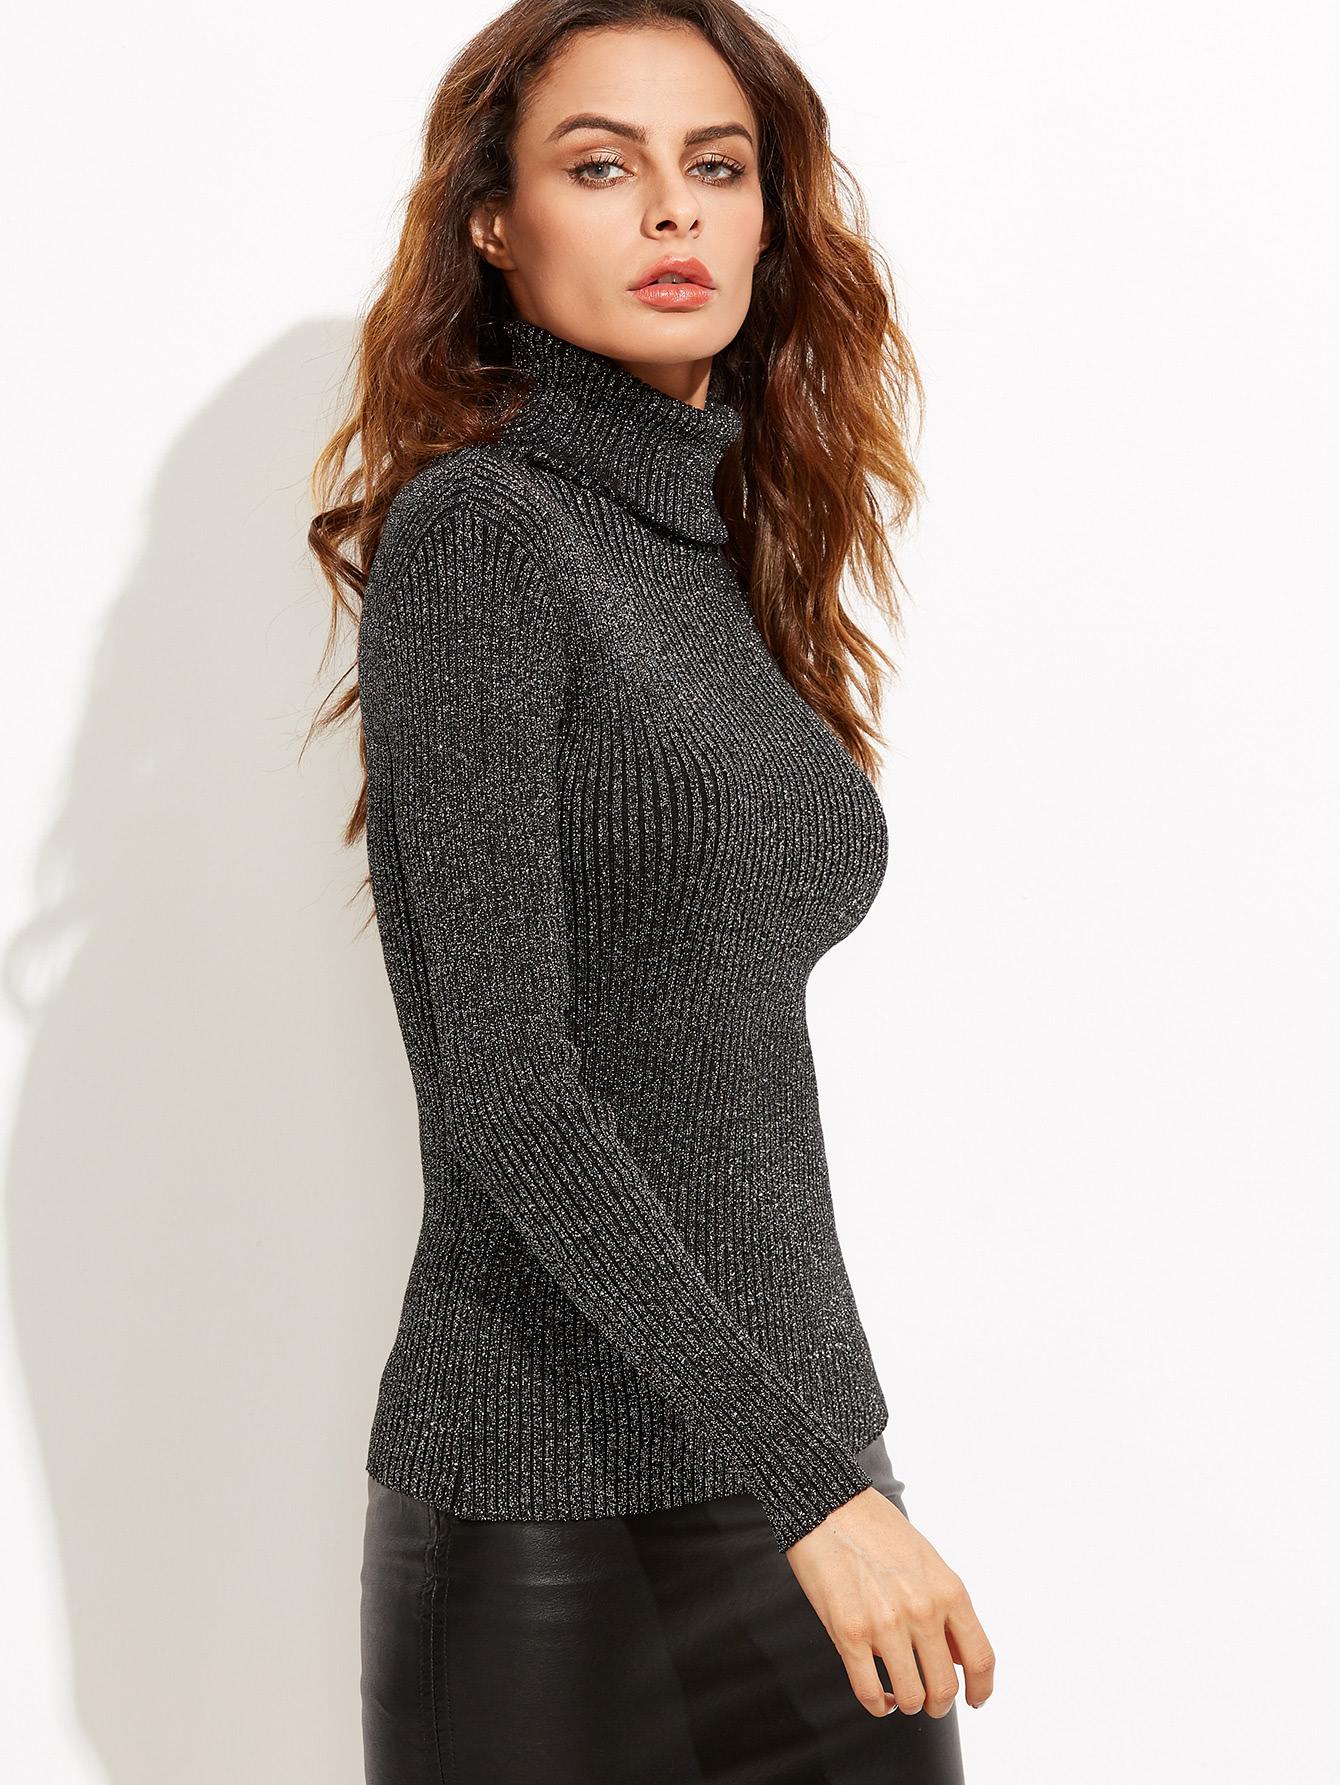 Black Turtleneck Ribbed Sweater